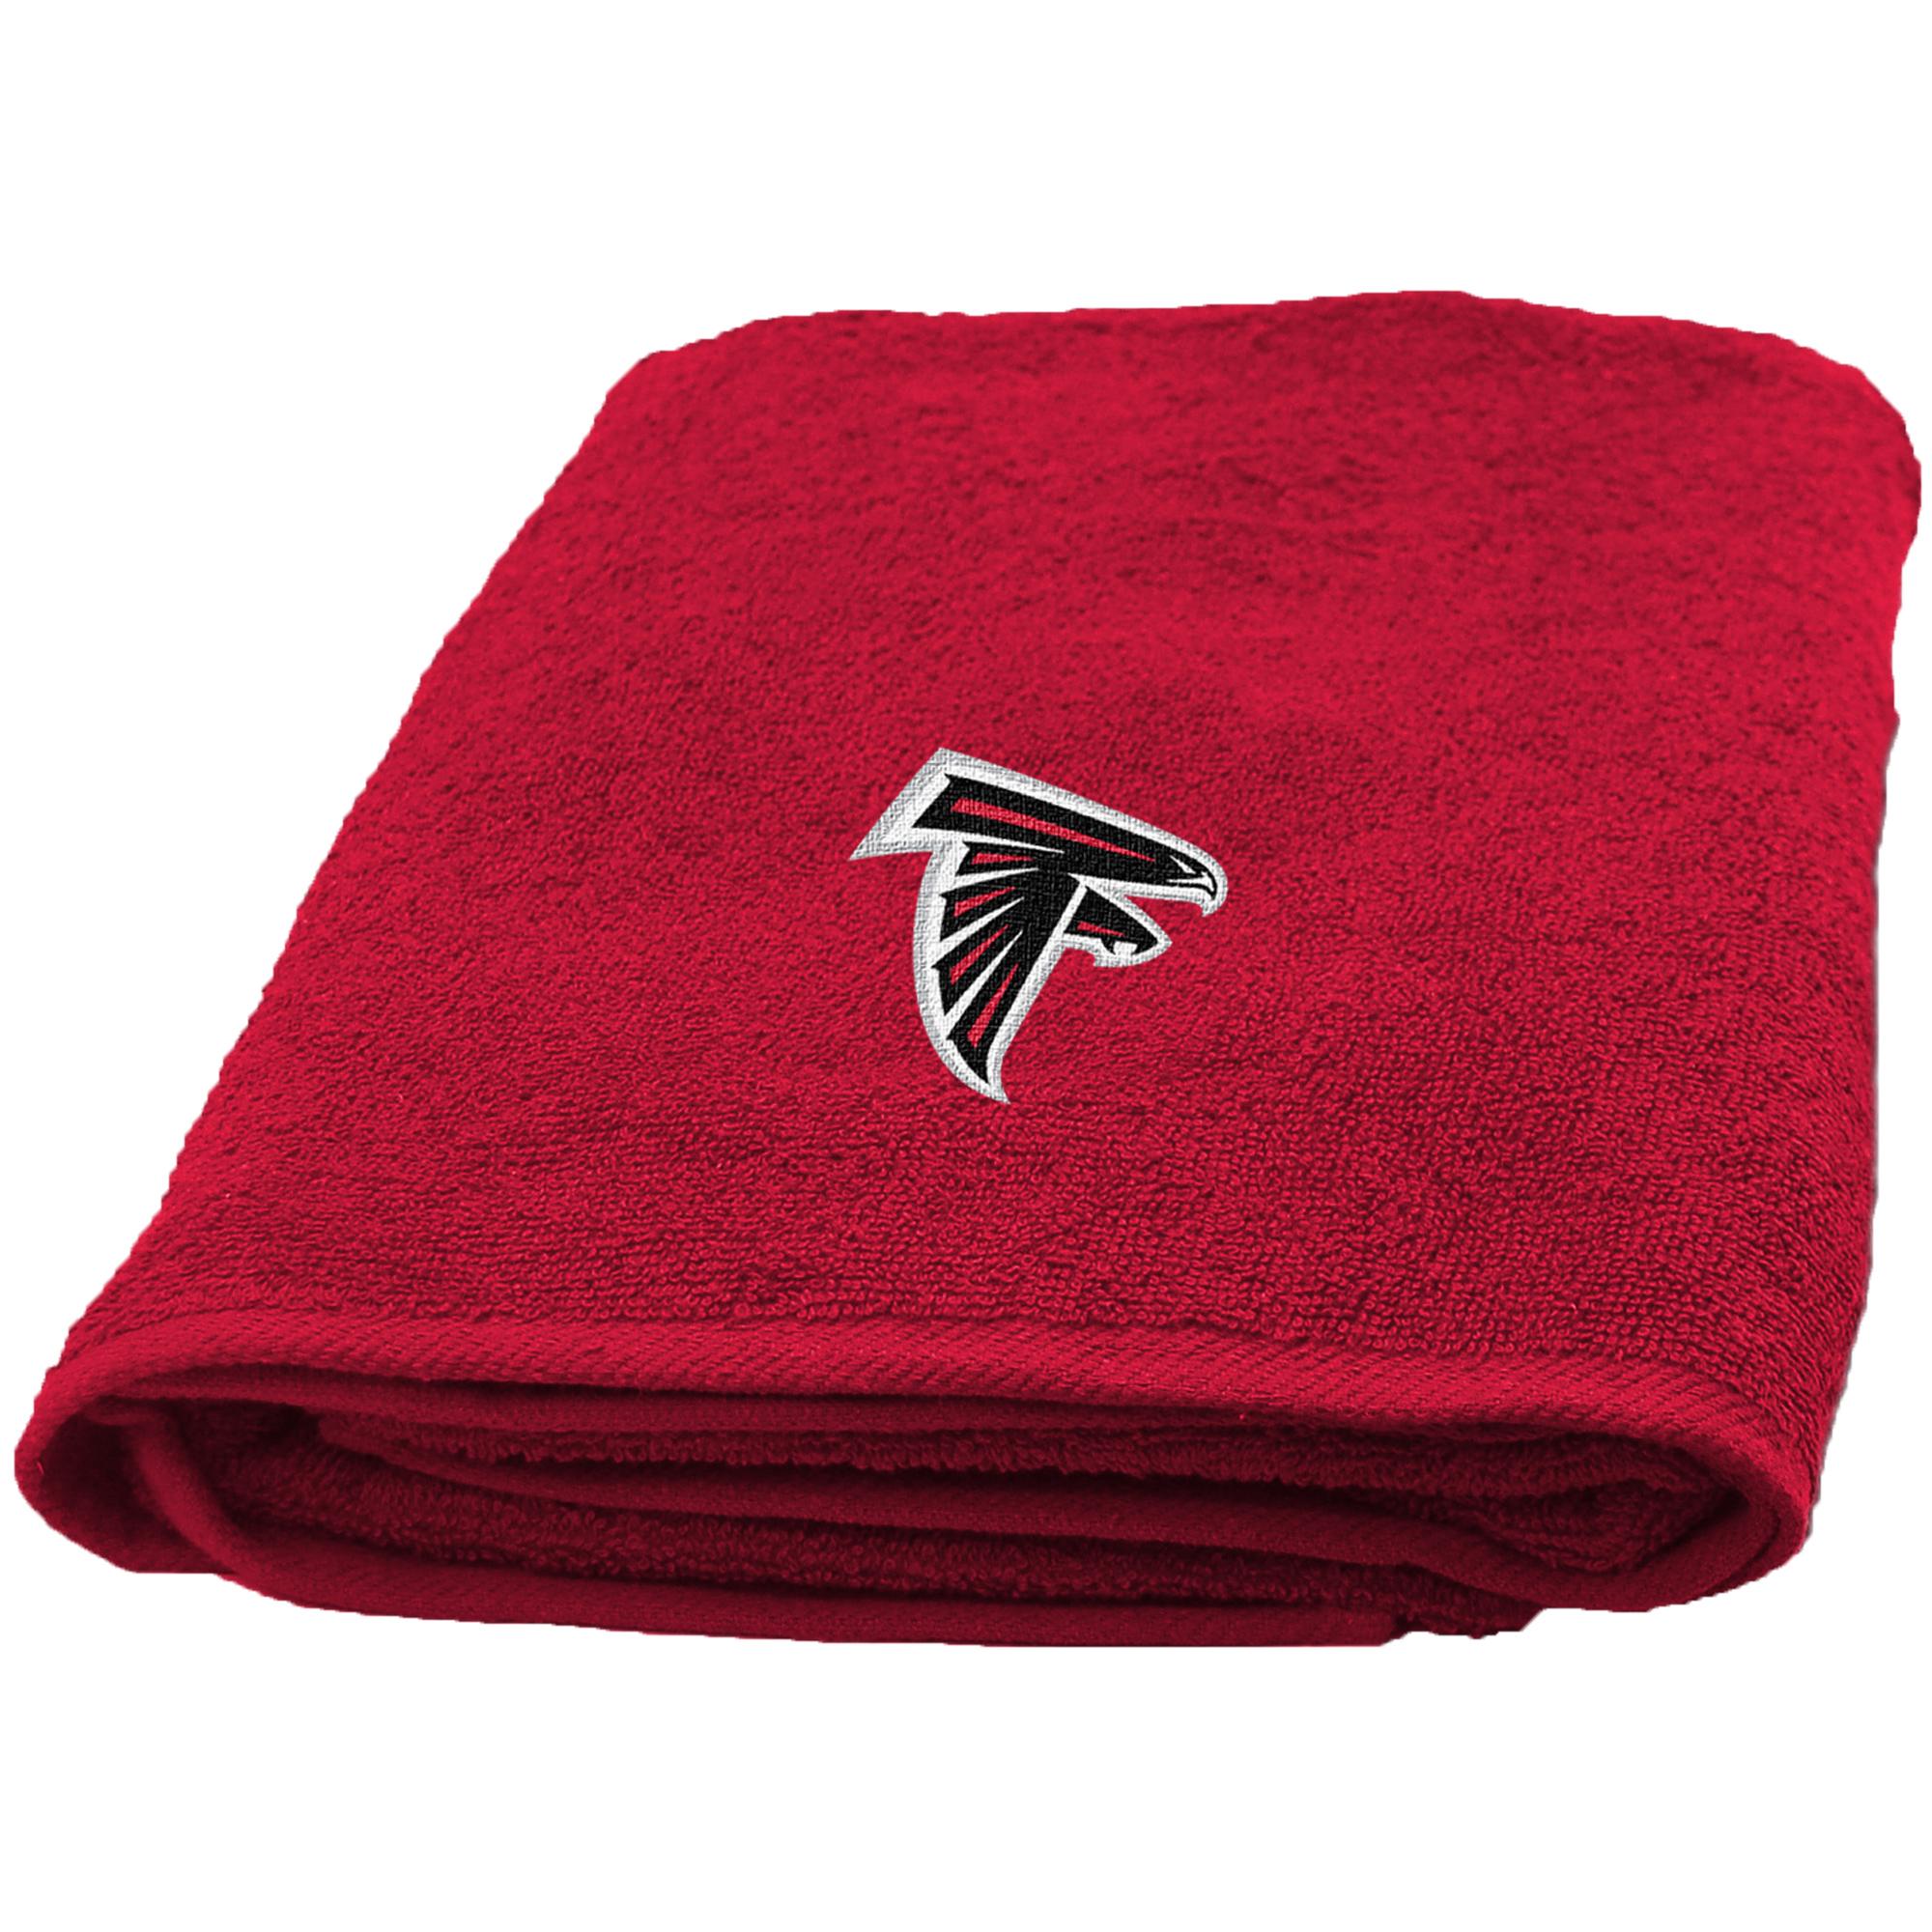 Atlanta Falcons The Northwest Company 25'' x 50'' Applique Bath Towel - No Size